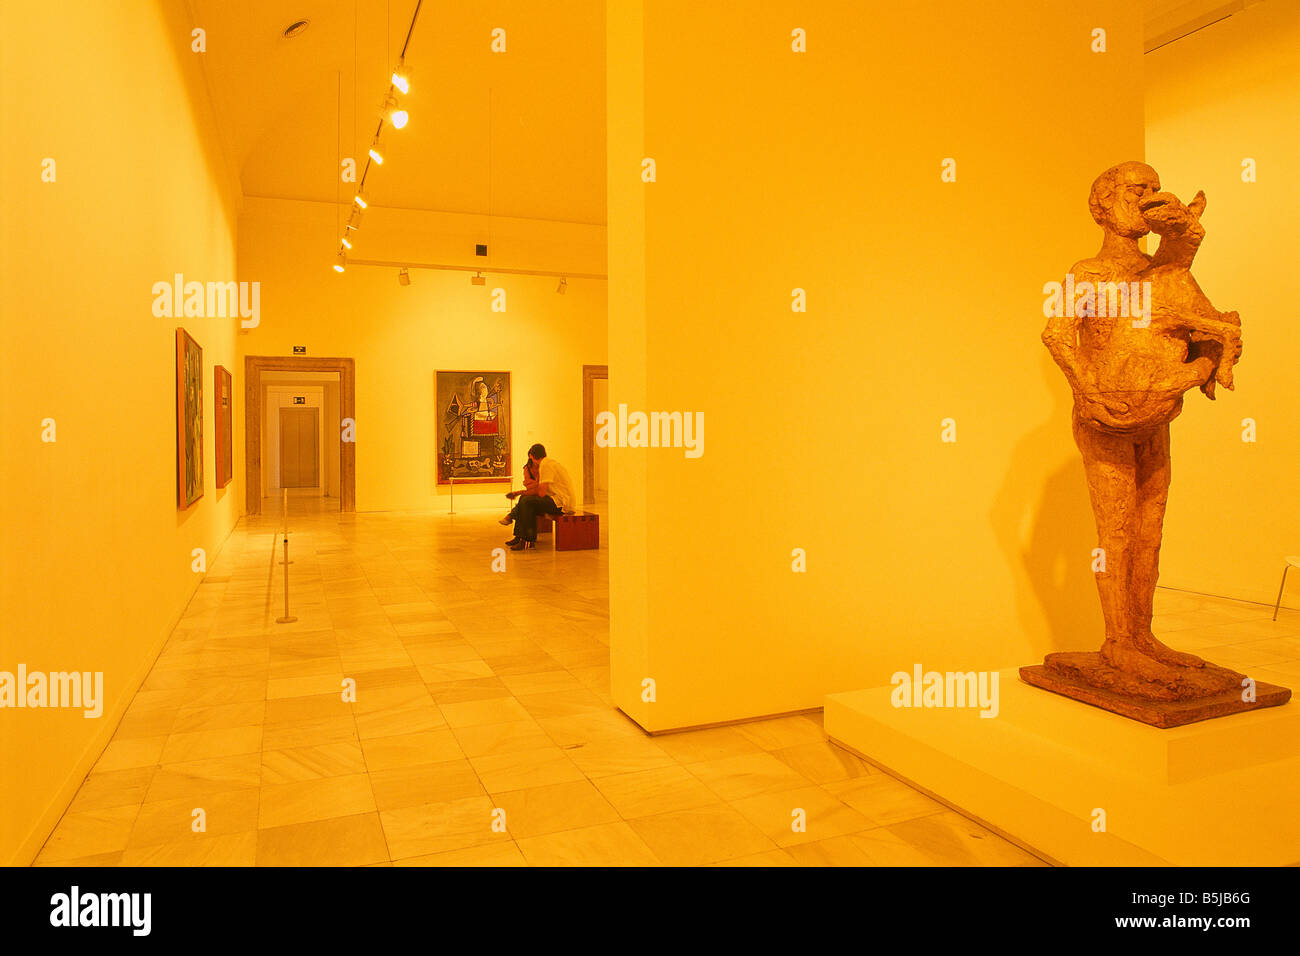 GroBartig Spanien   Madrid   Königin Sofia Kunst Mitte   Museum Der Moderne Des 20.  Jahrhunderts   Kunst